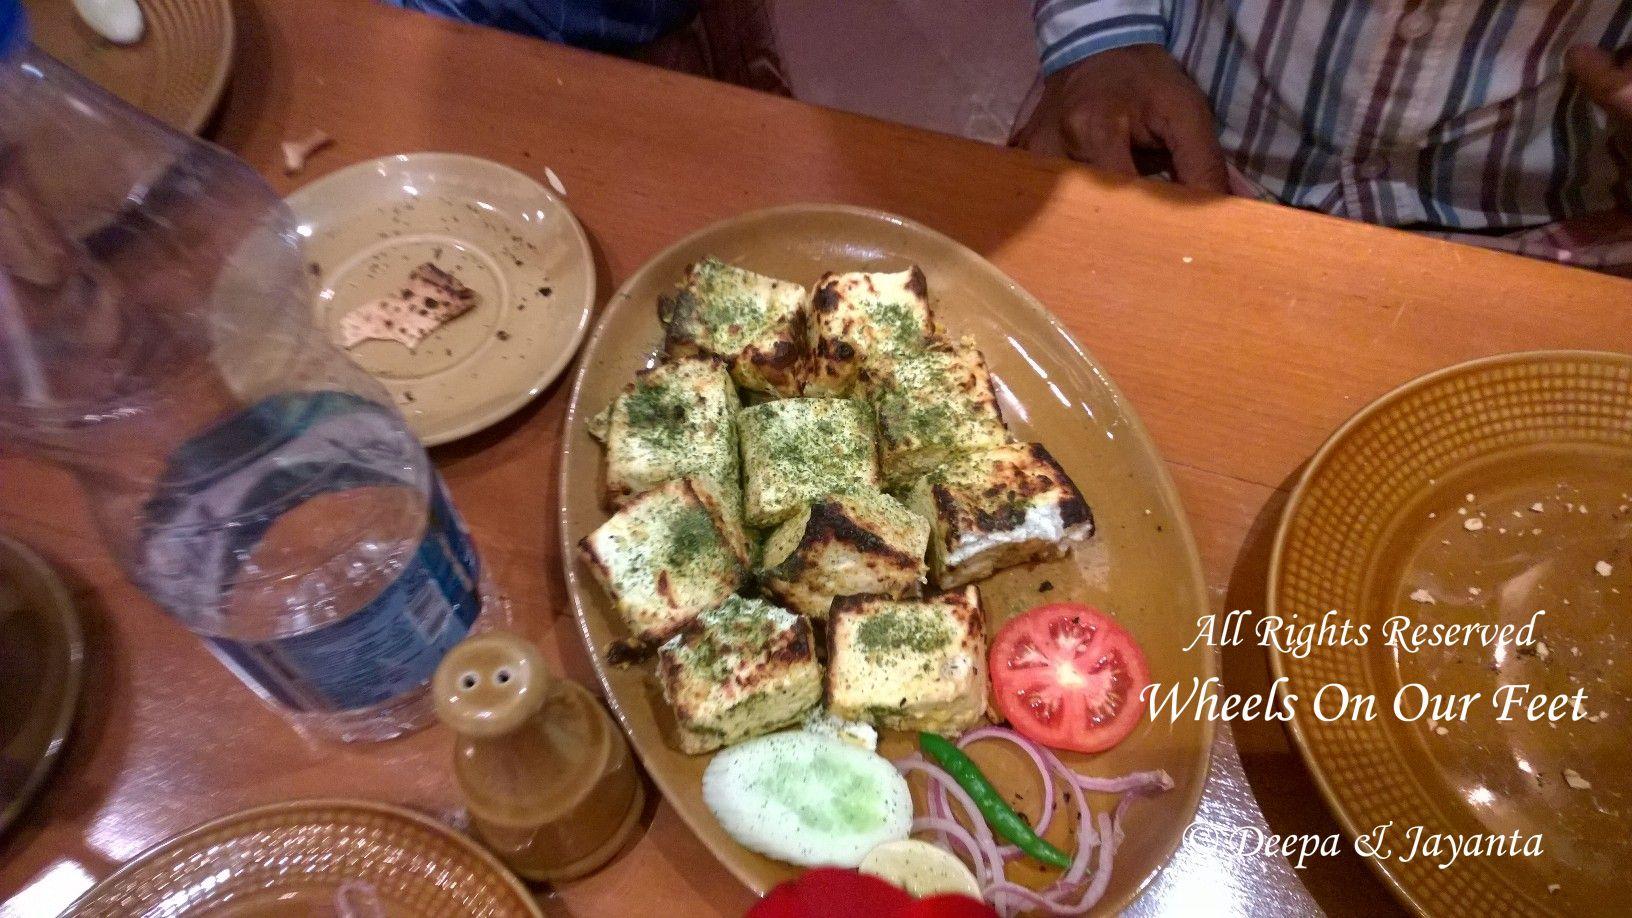 Restaurant Review: Peshawri at ITC Maratha, Mumbai